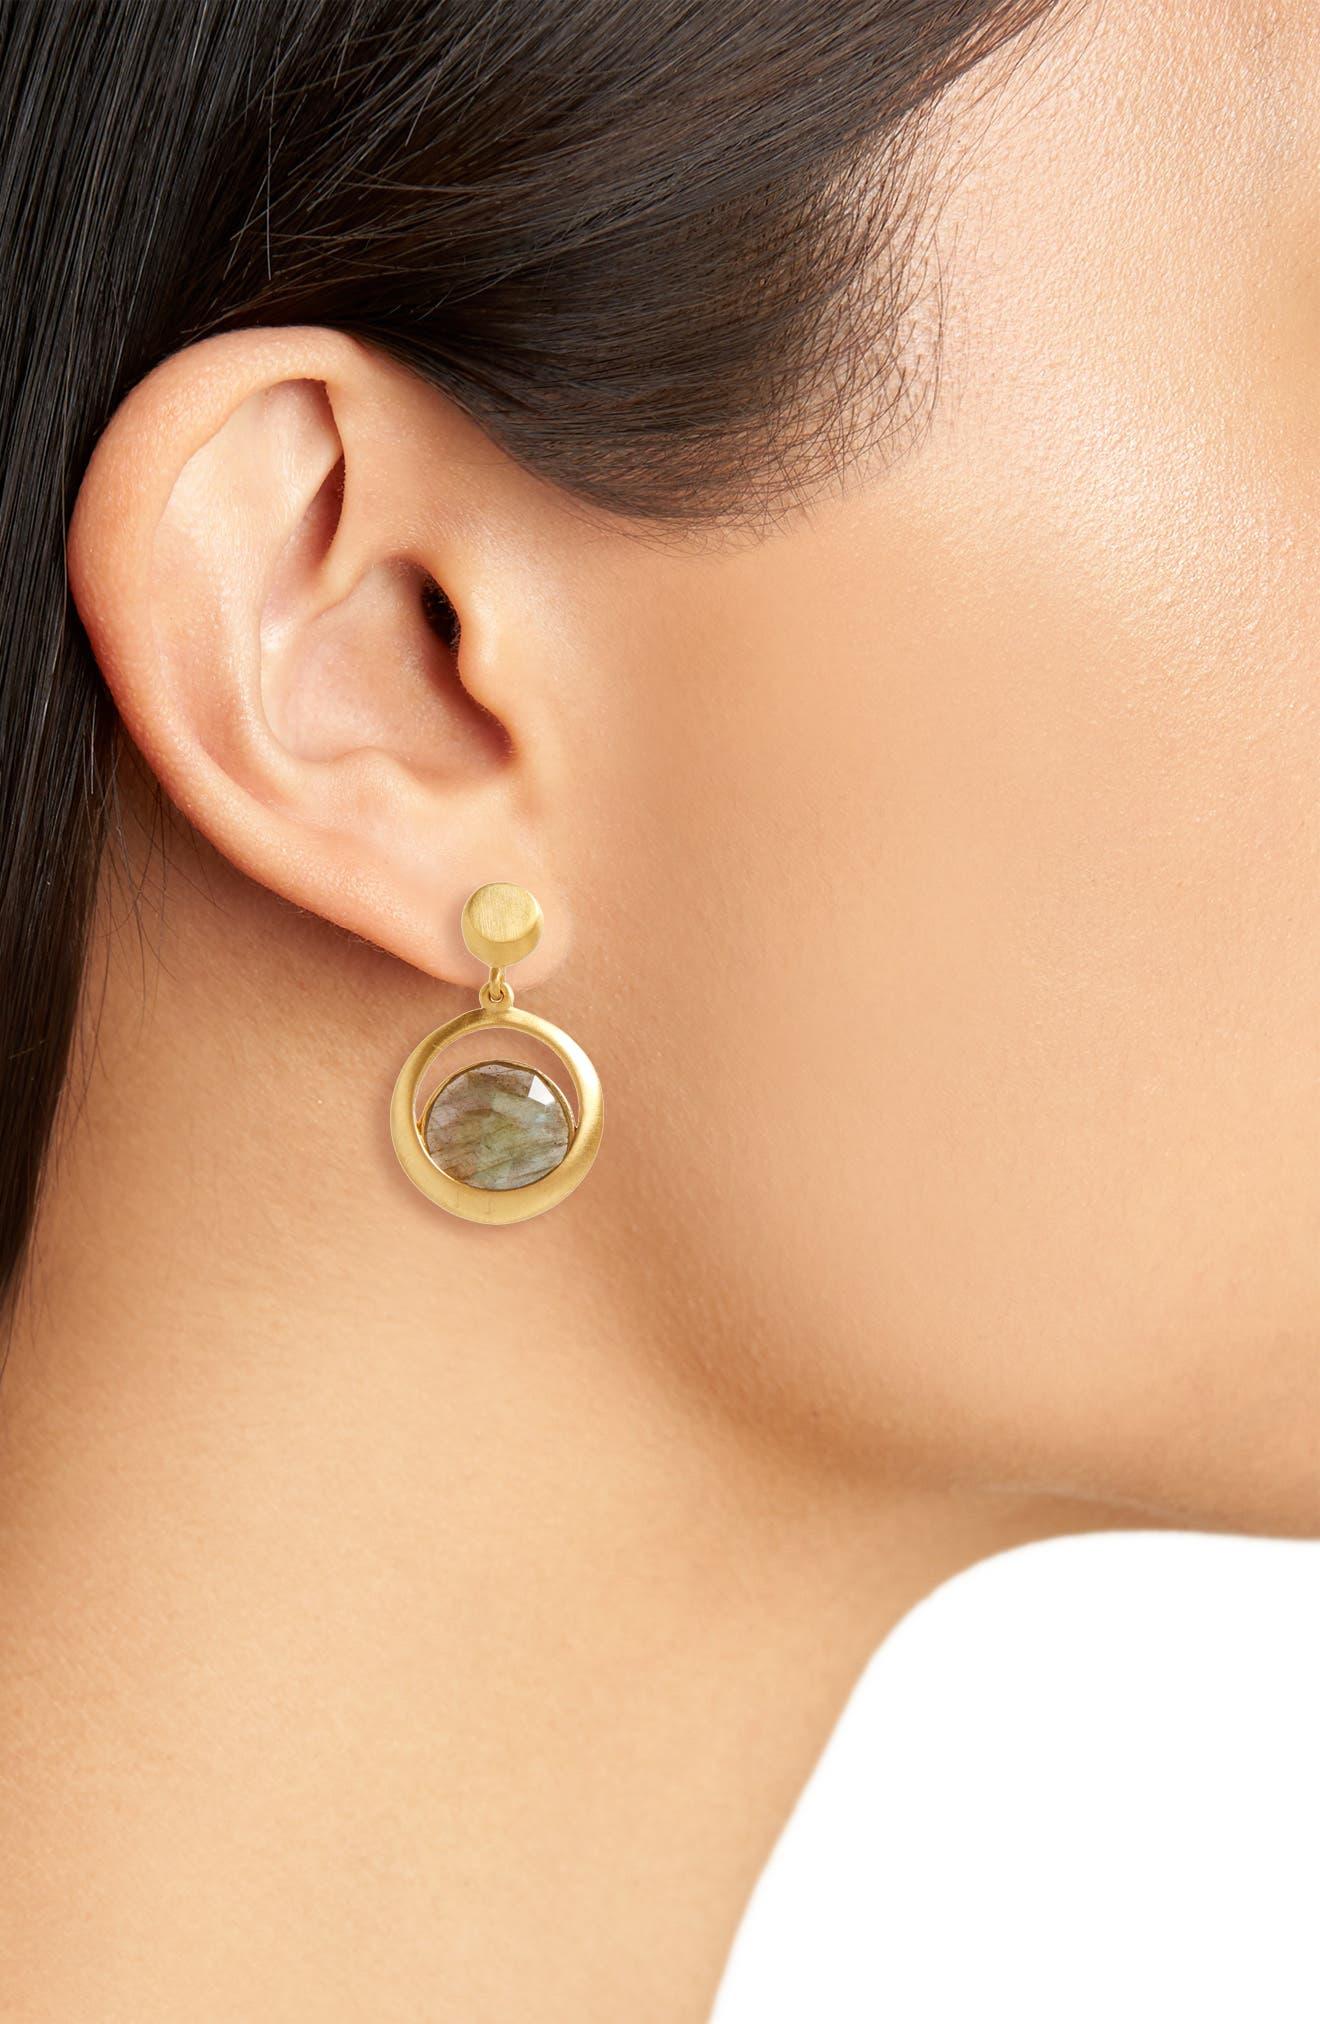 Lapa Semiprecious Stone Drop Earrings,                             Alternate thumbnail 2, color,                             Labradorite/ Gold